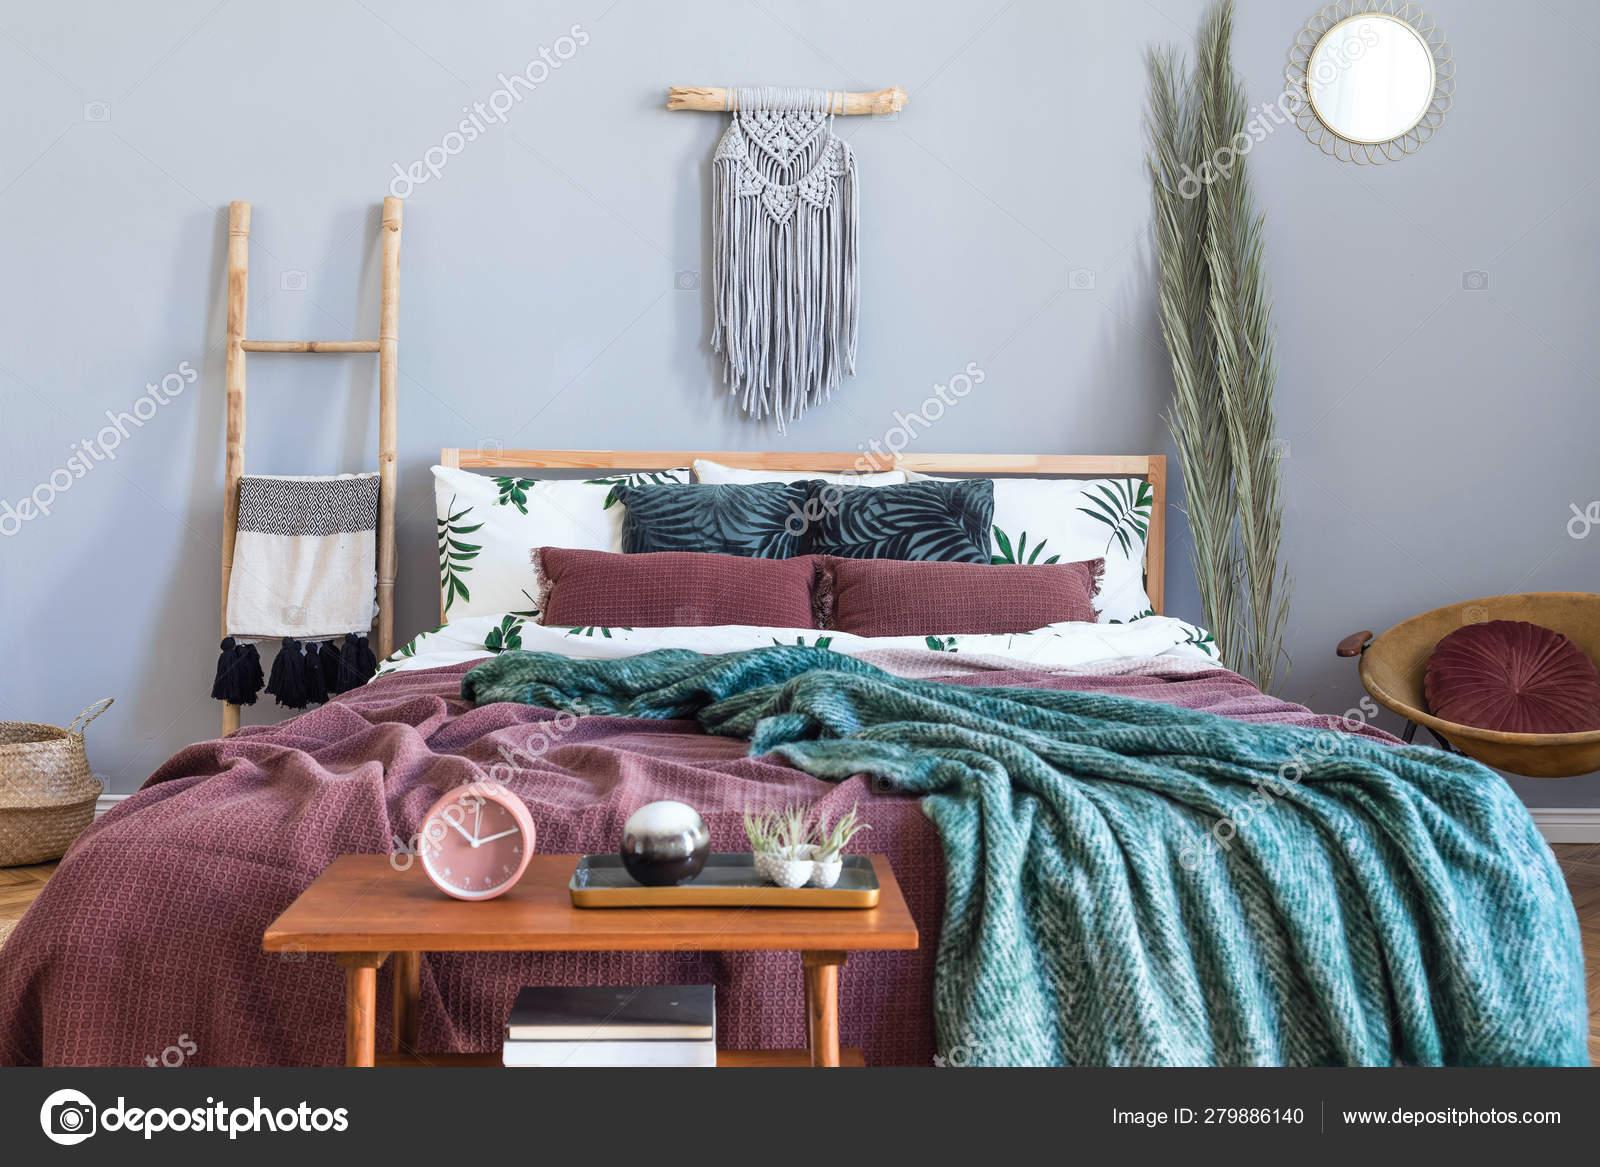 Modern Luxury Interior Bedroom Design Furnitures Stylish Macrame Wooden Ladder Stock Photo C Followtheflow 279886140